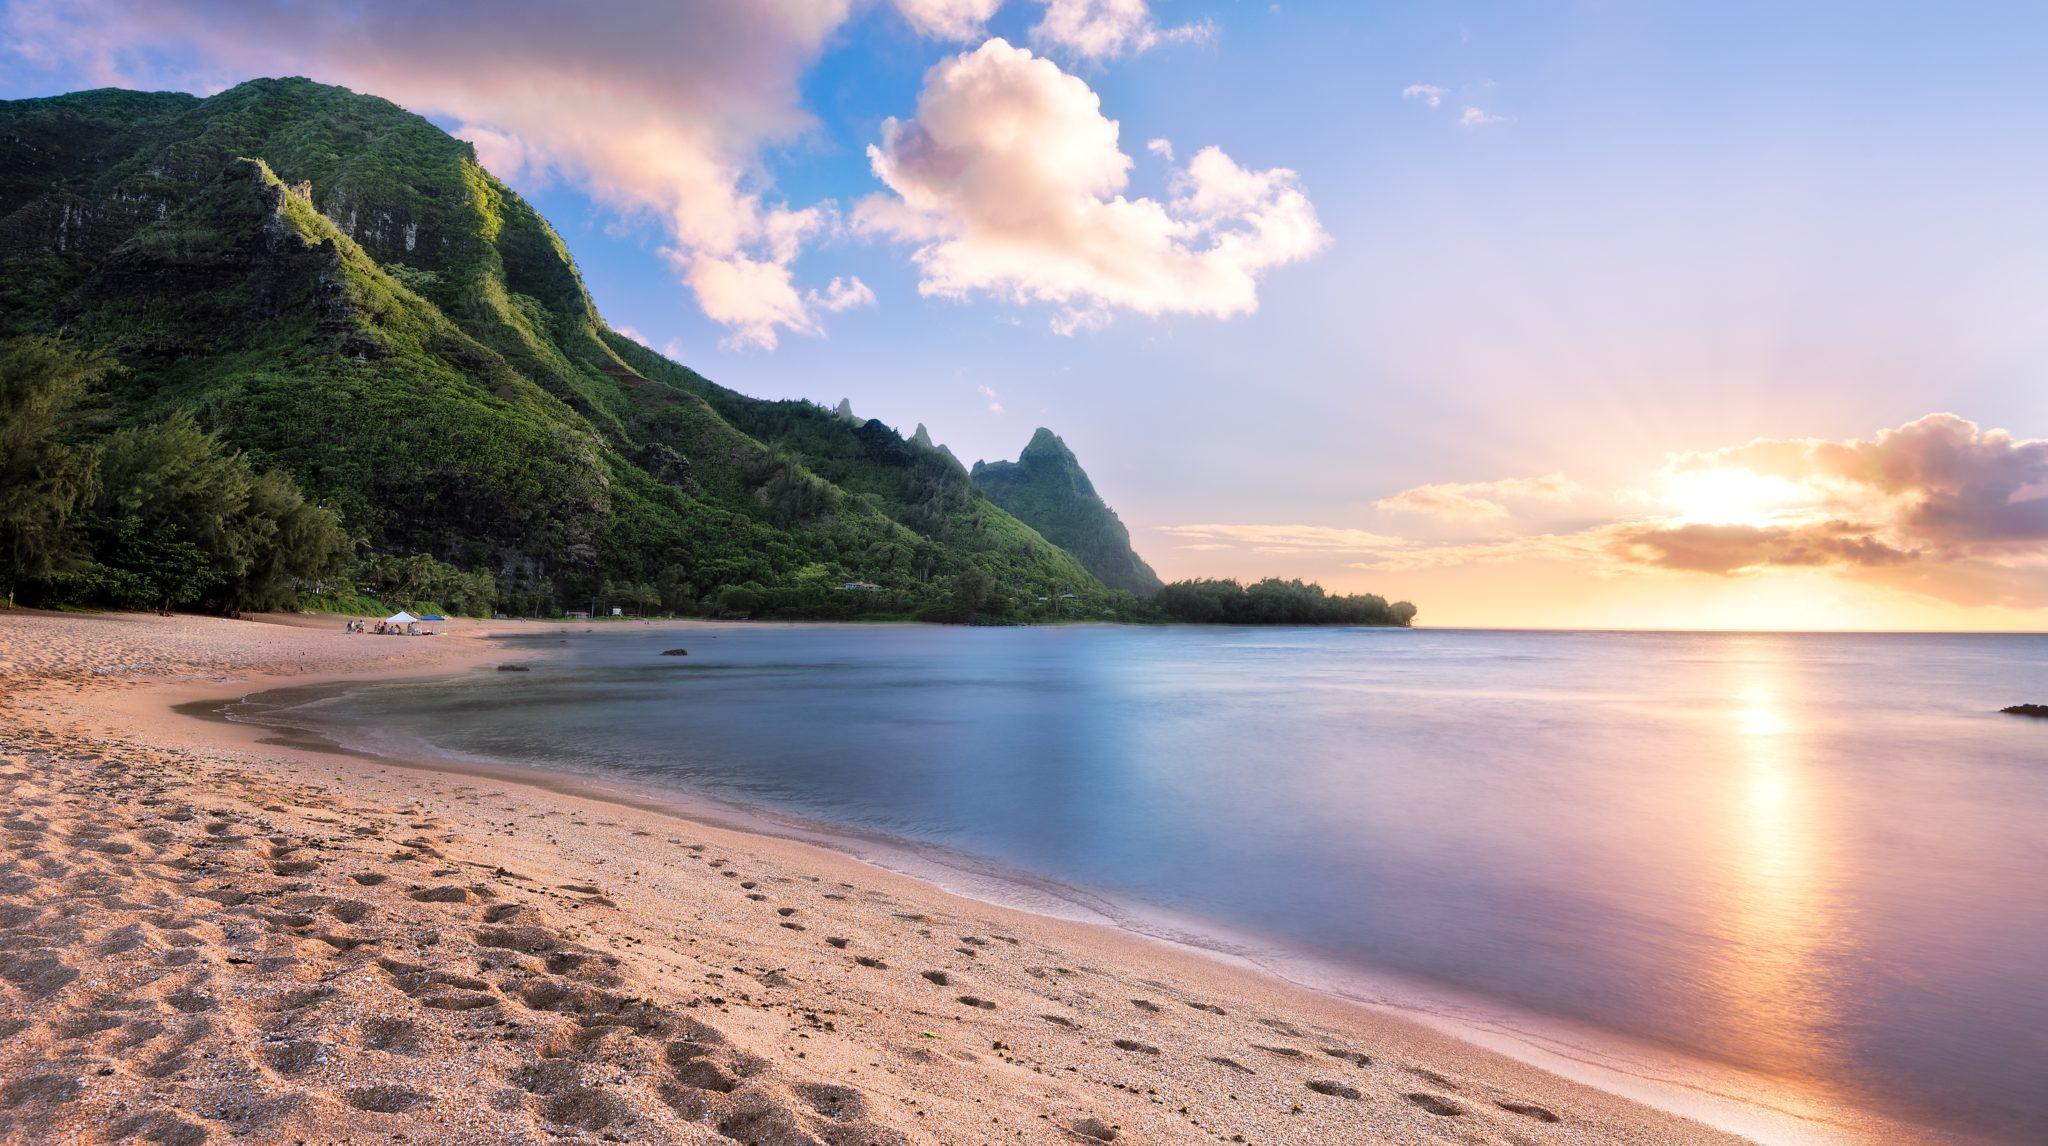 9 Day hawaii itinerary